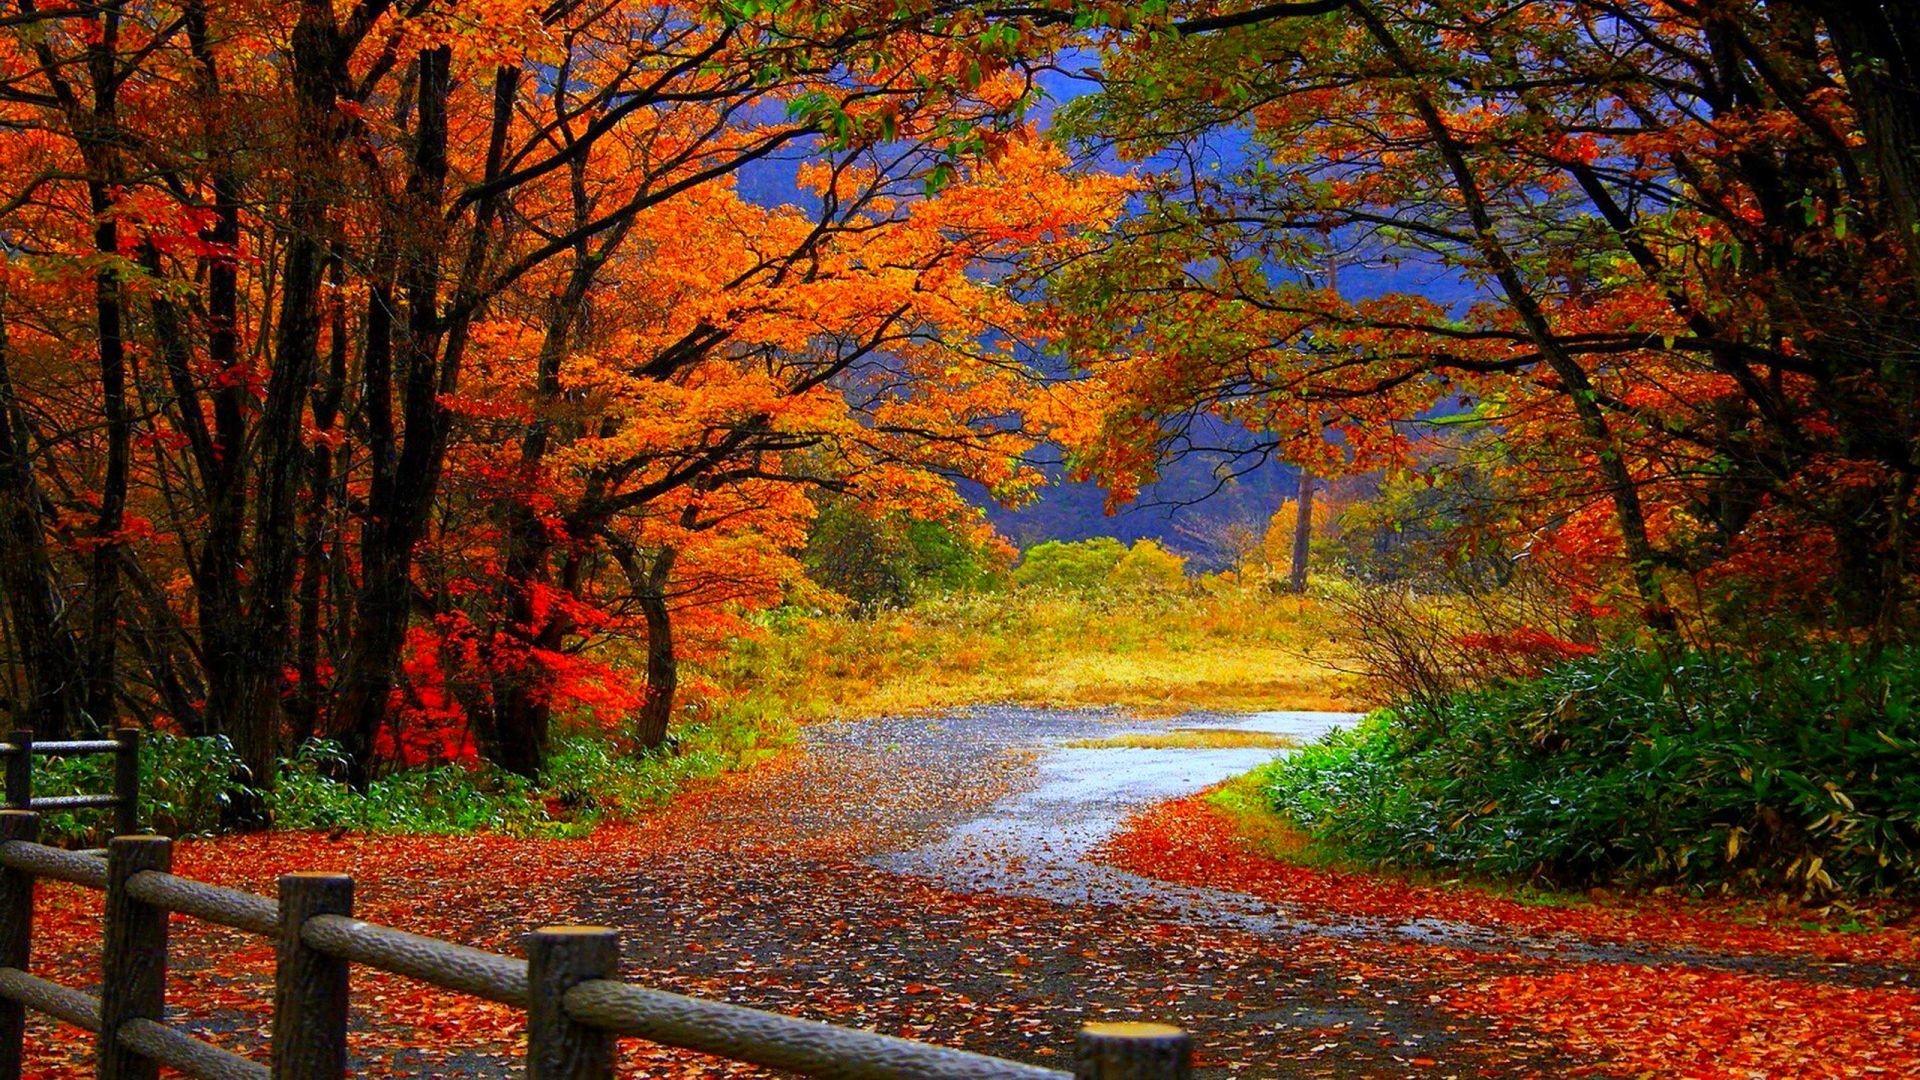 Autumn wallpaper backgrounds 60 images - Computer wallpaper nature ...